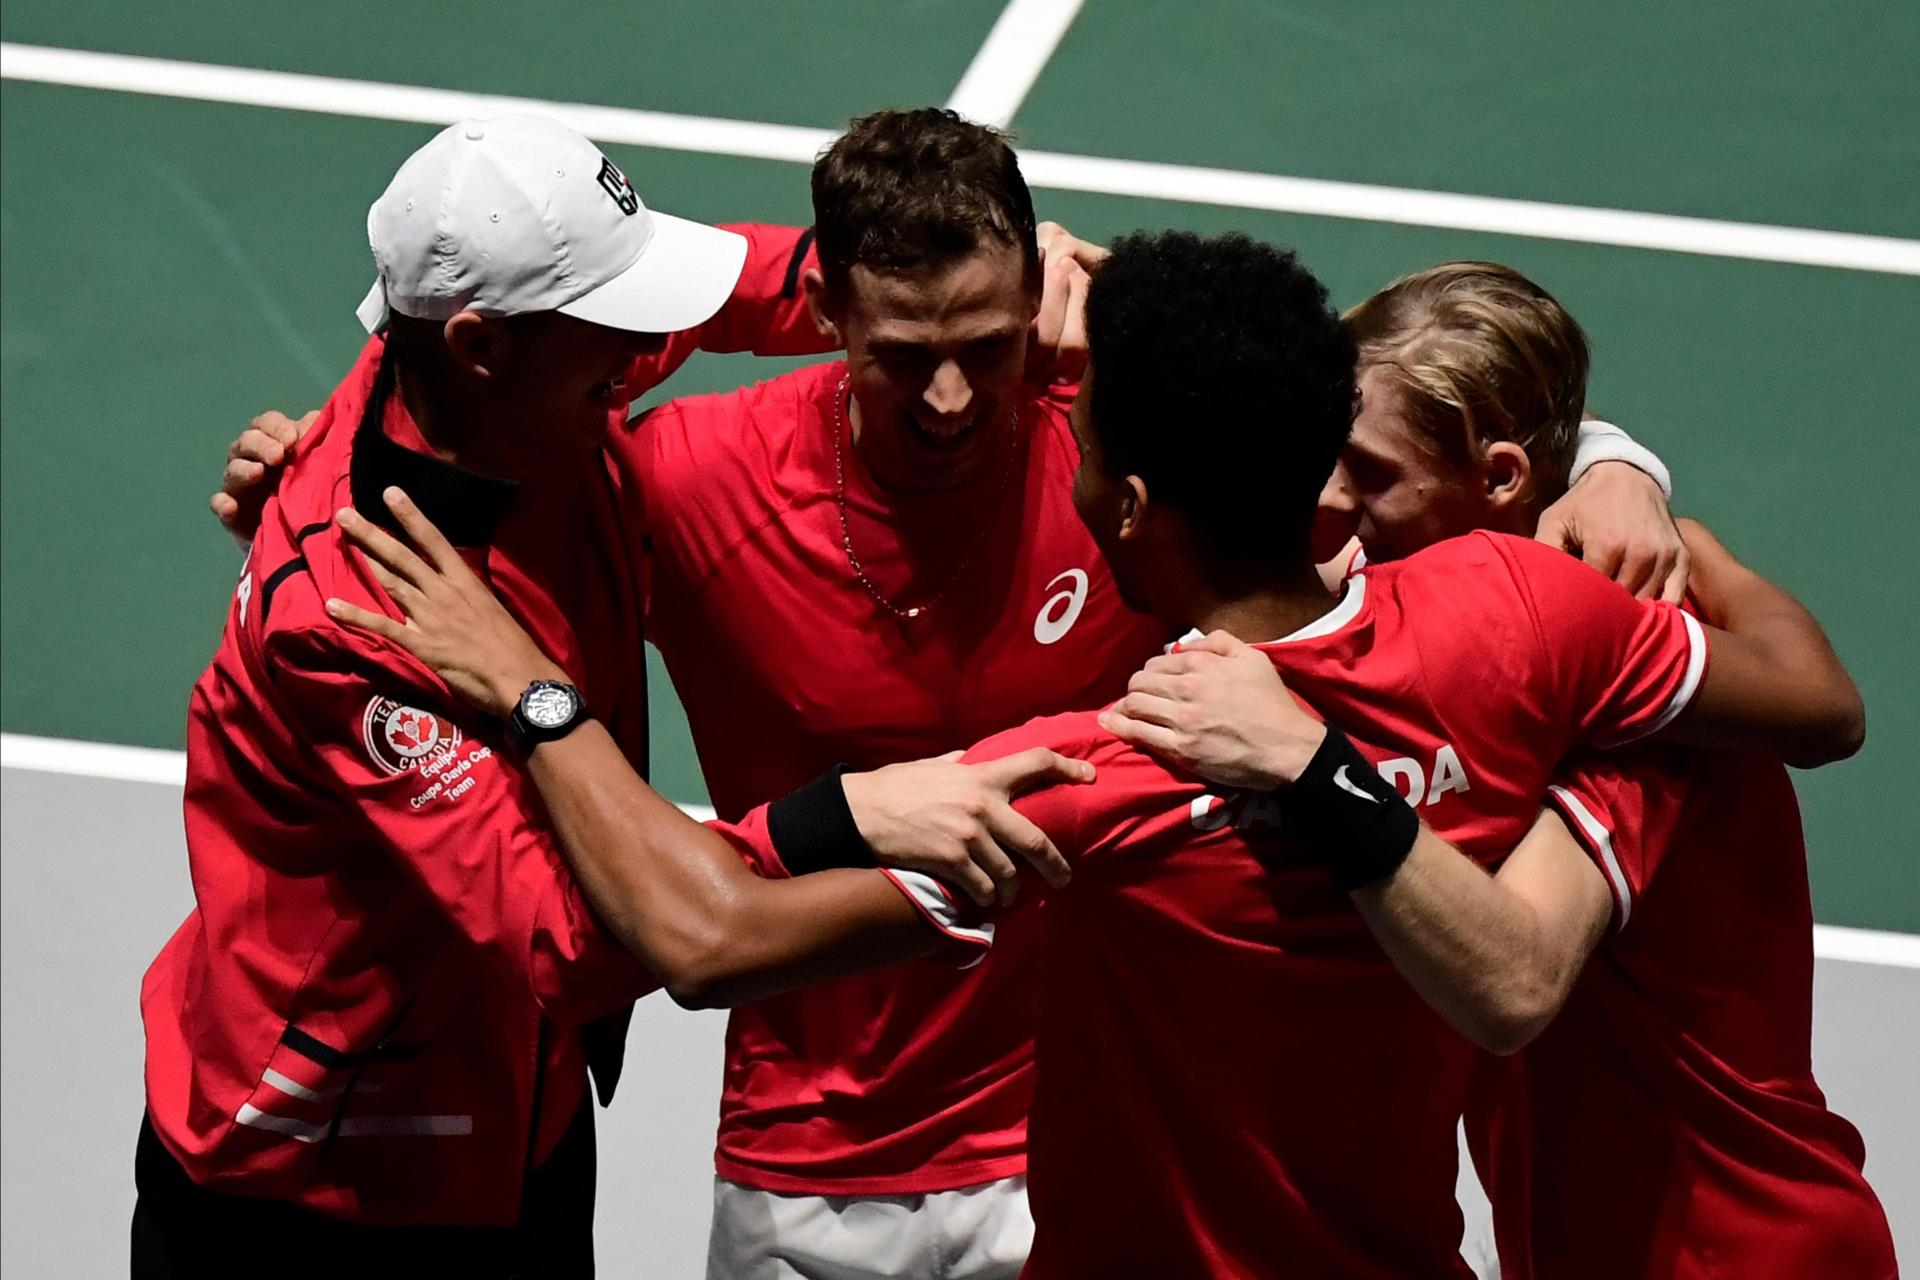 Canada reach Davis Cup semi-finals after ousting Australia